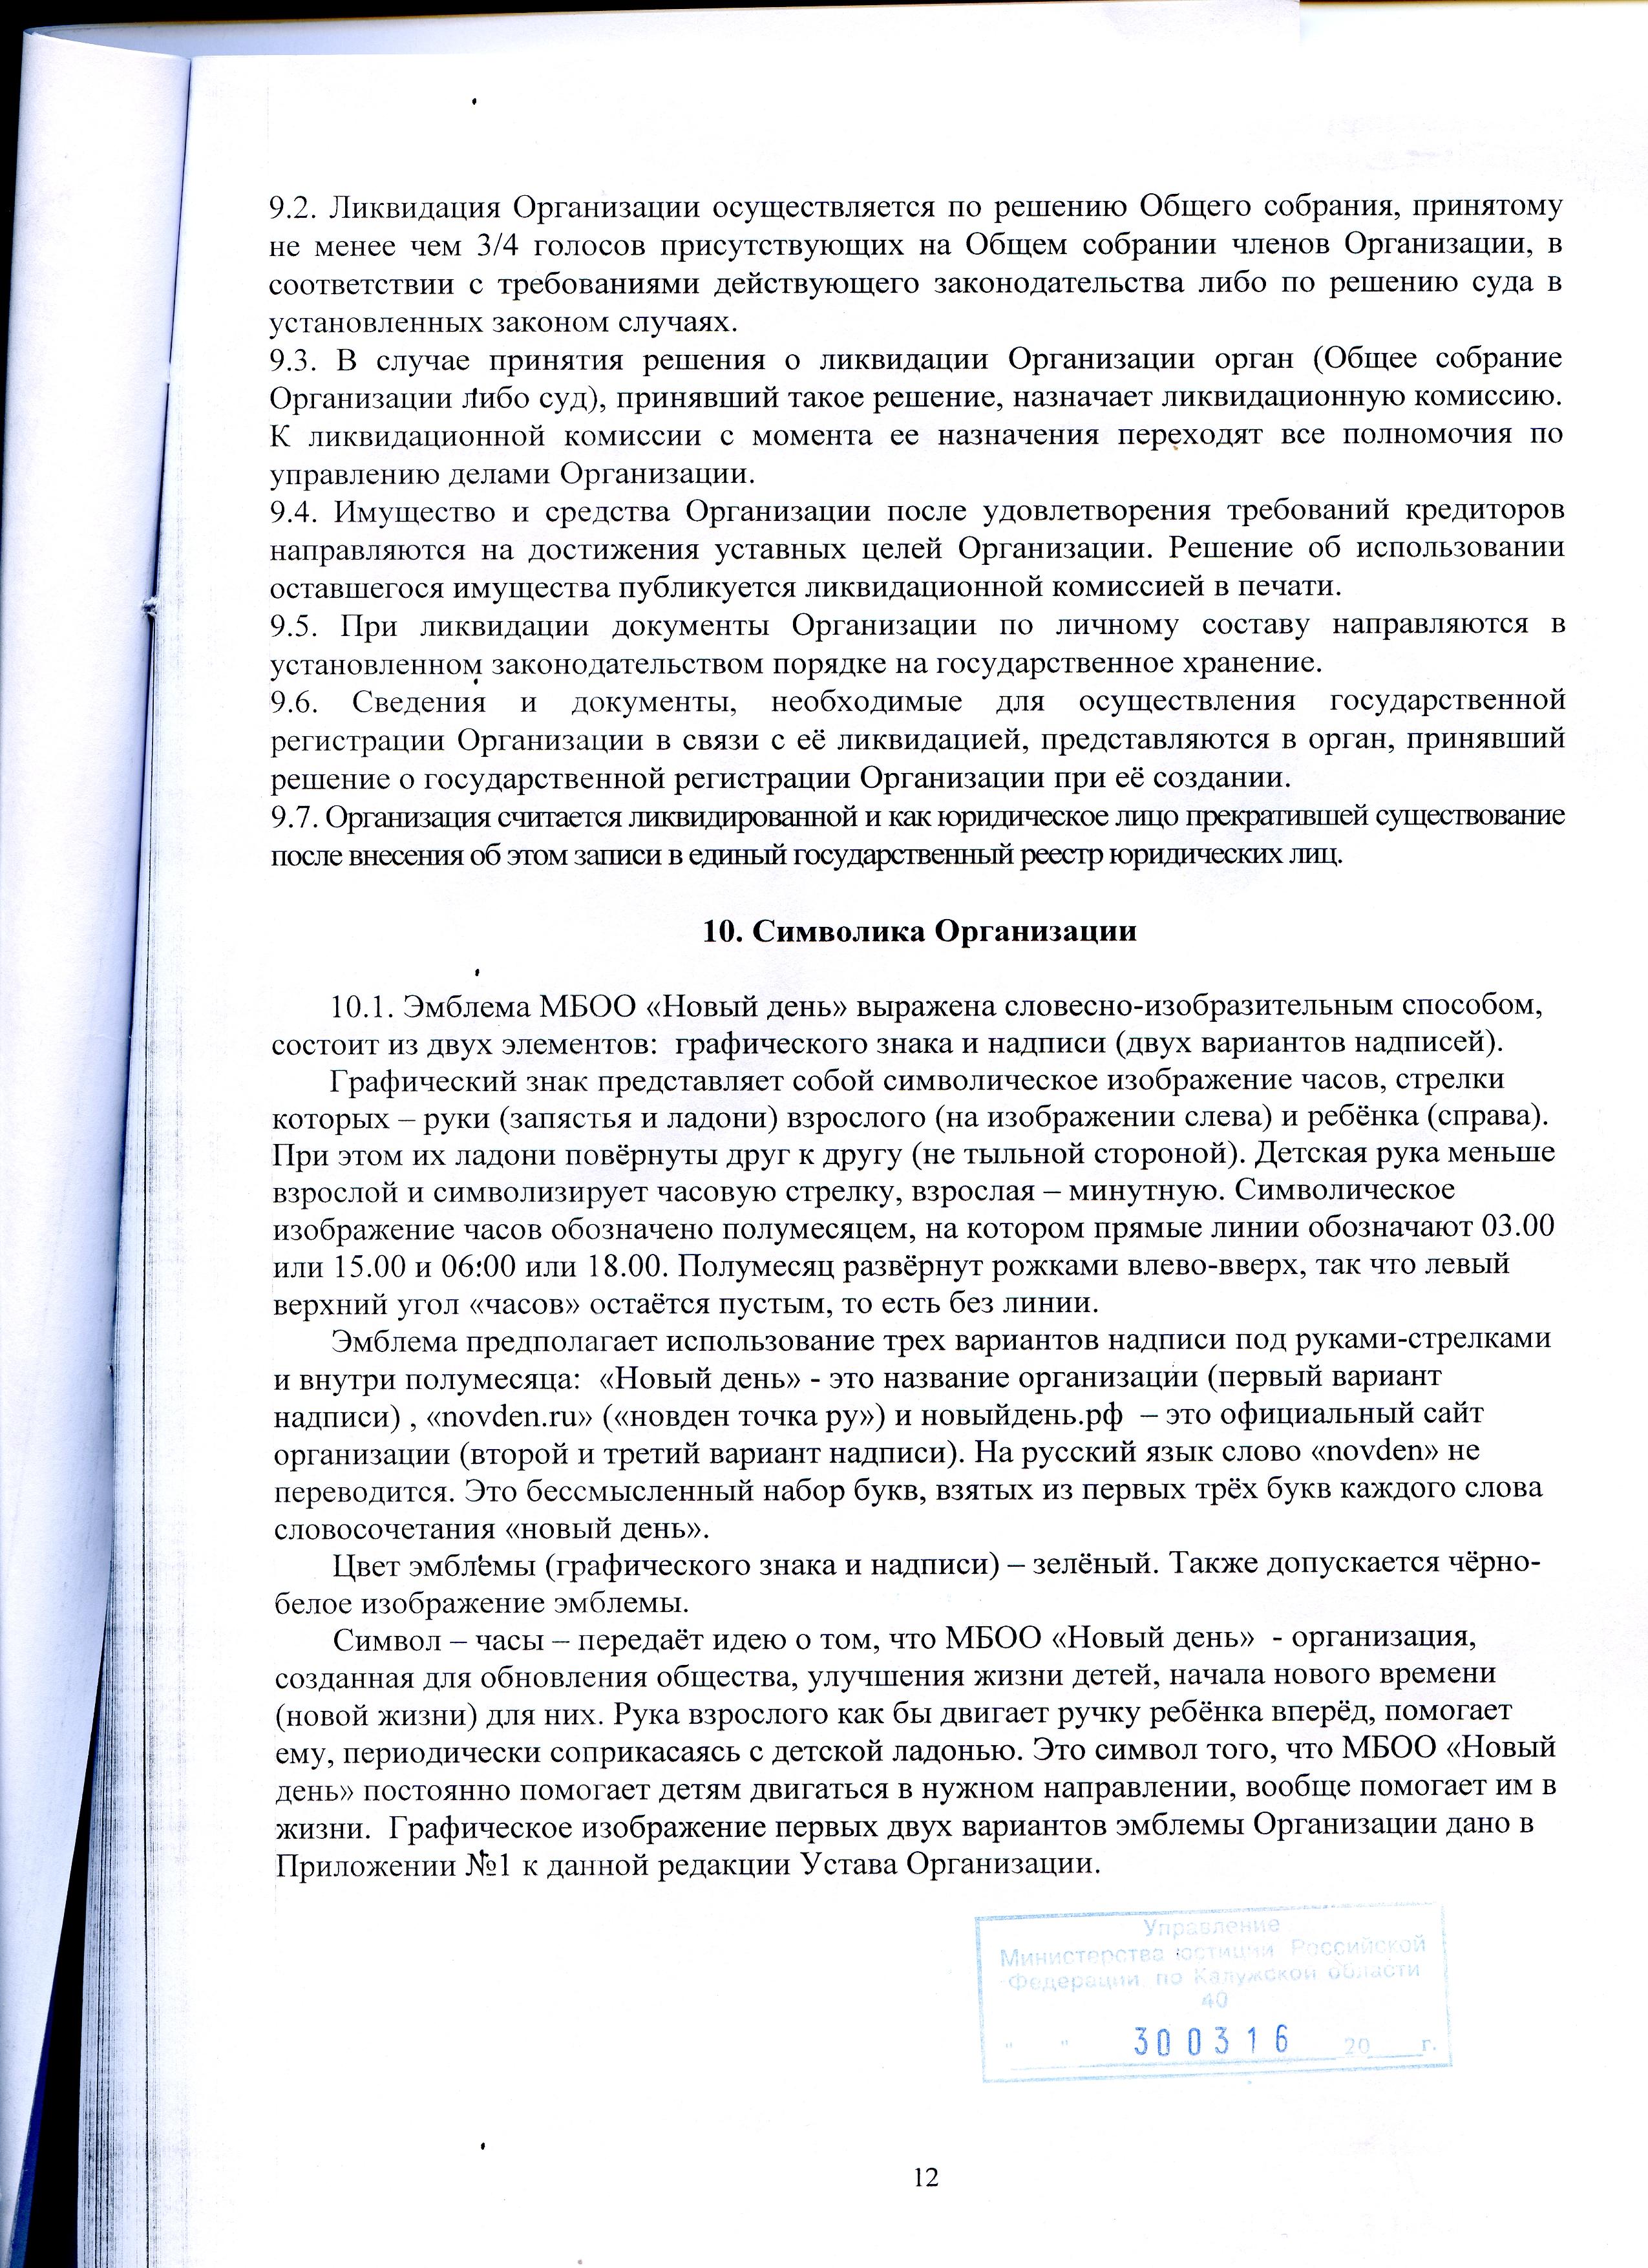 Устав НД 2 редакция074